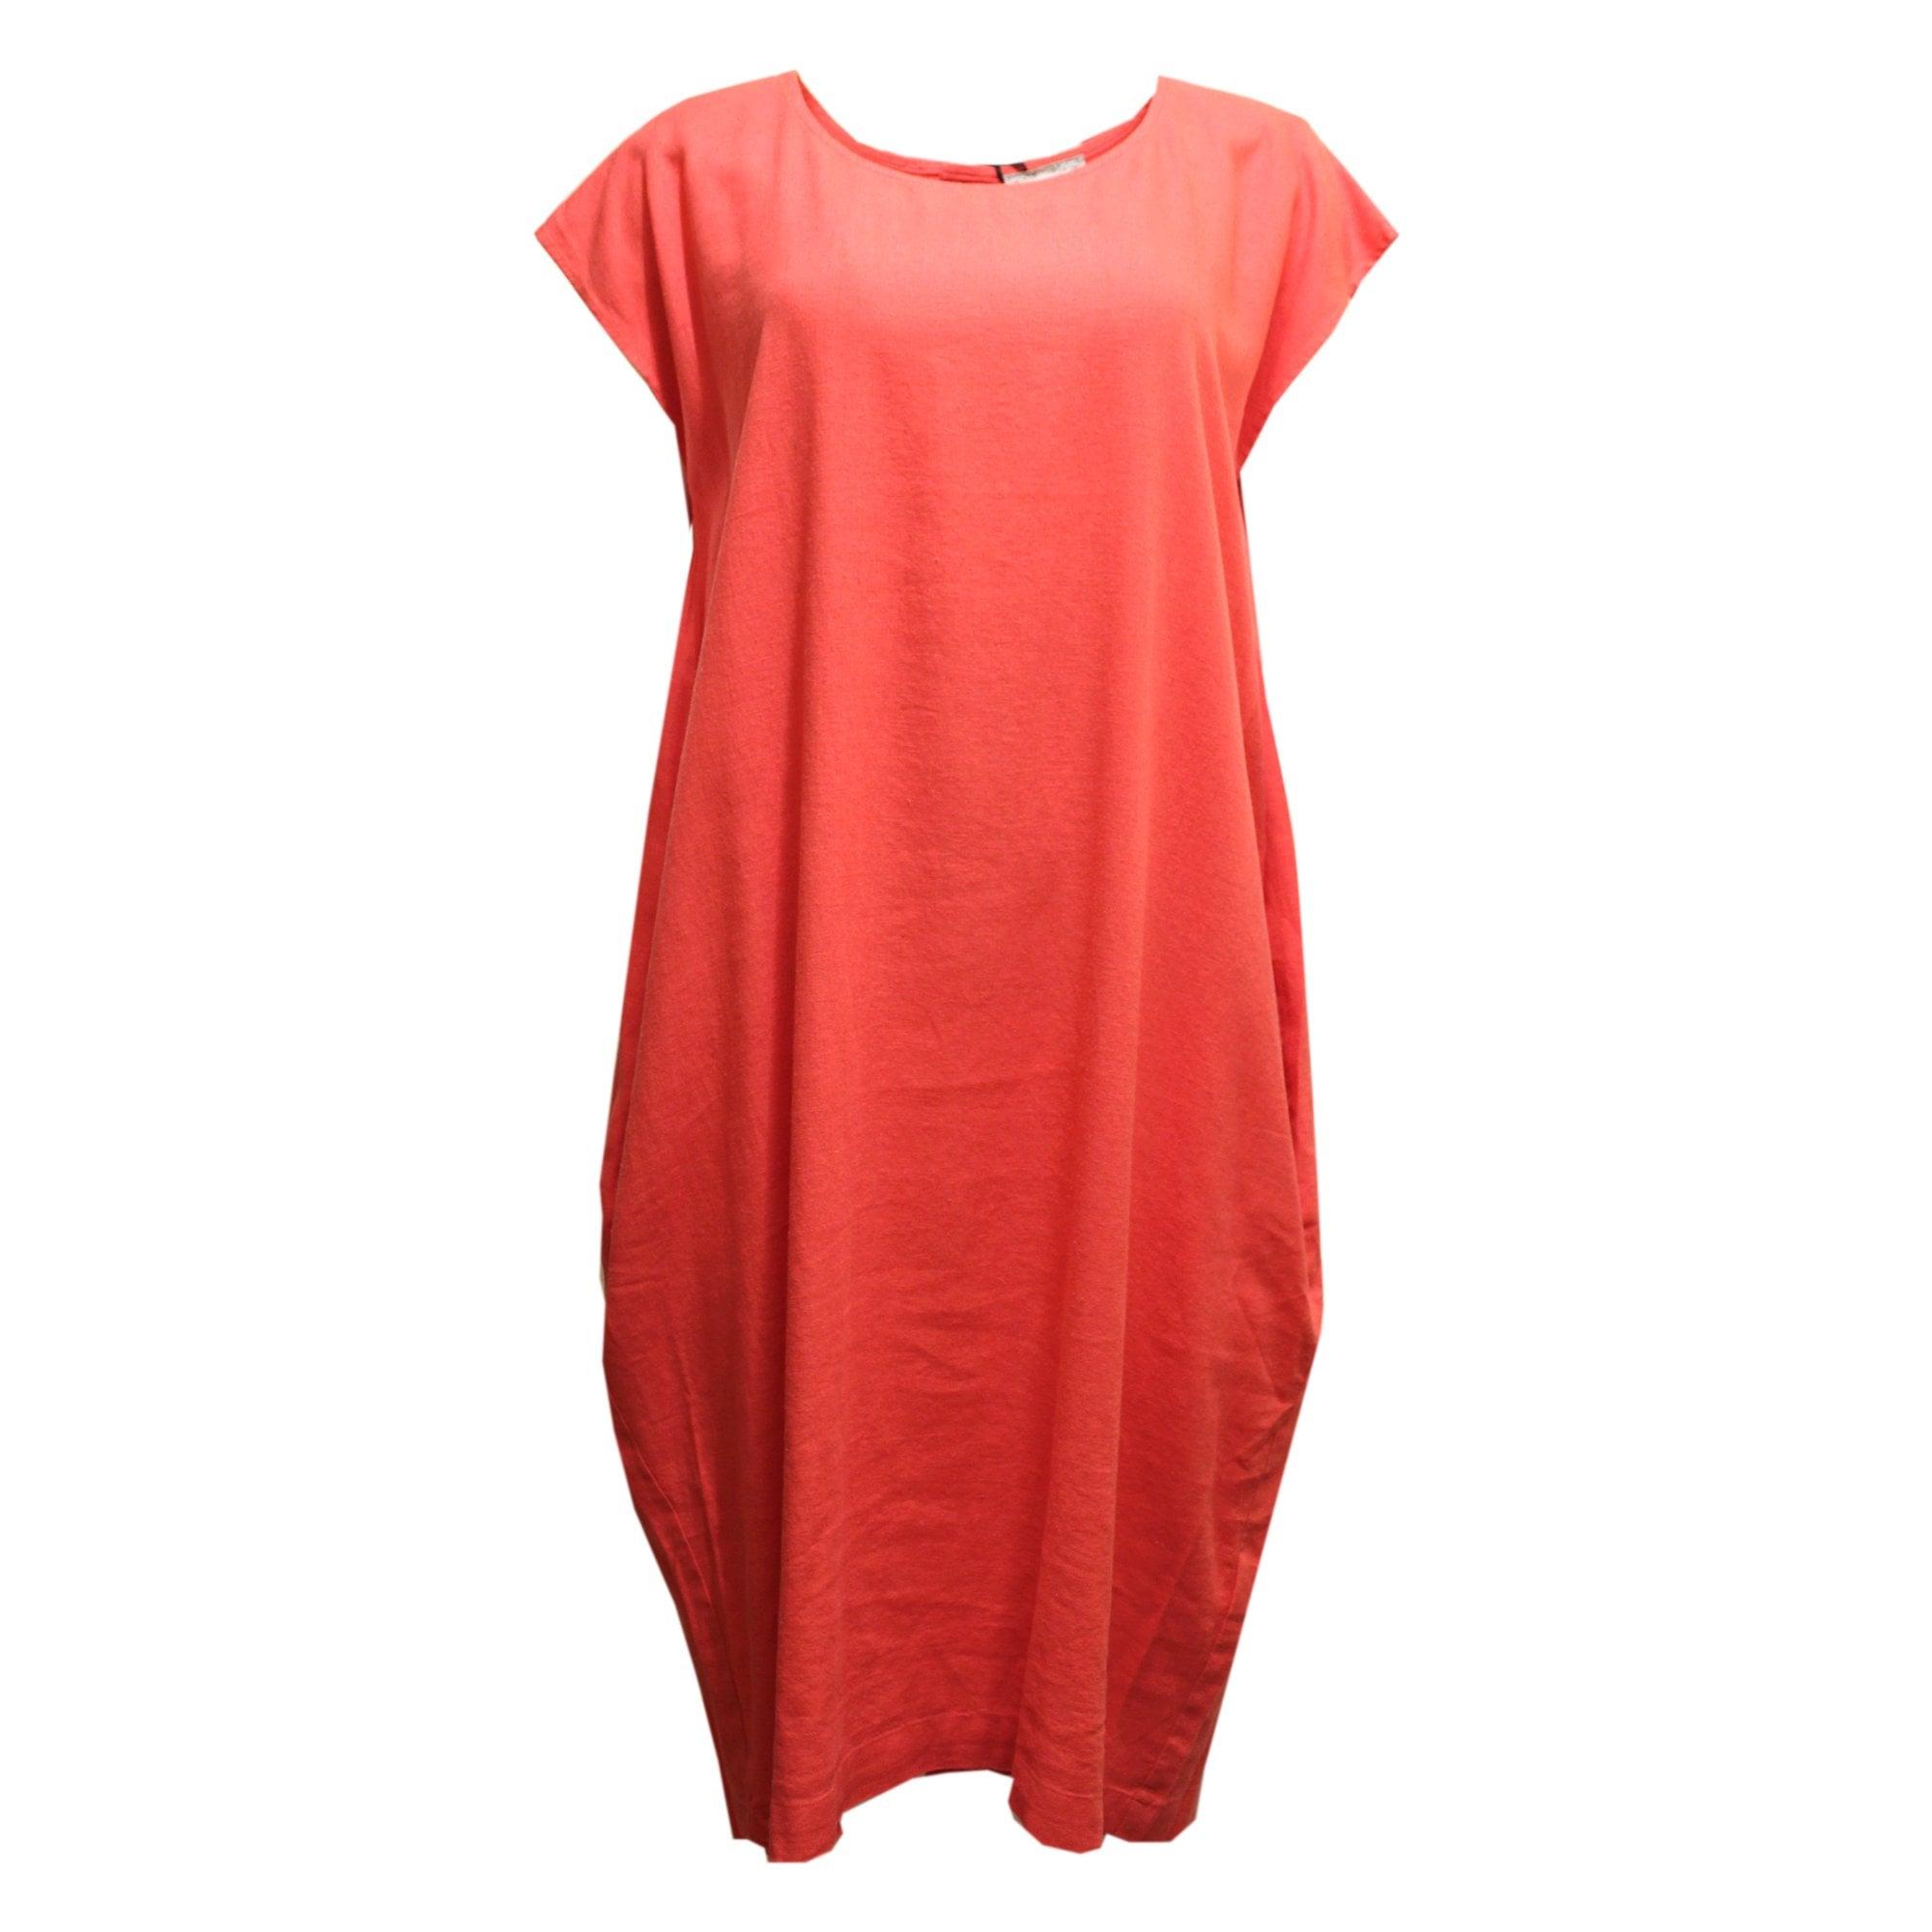 Soft B Coral Dress 392 522